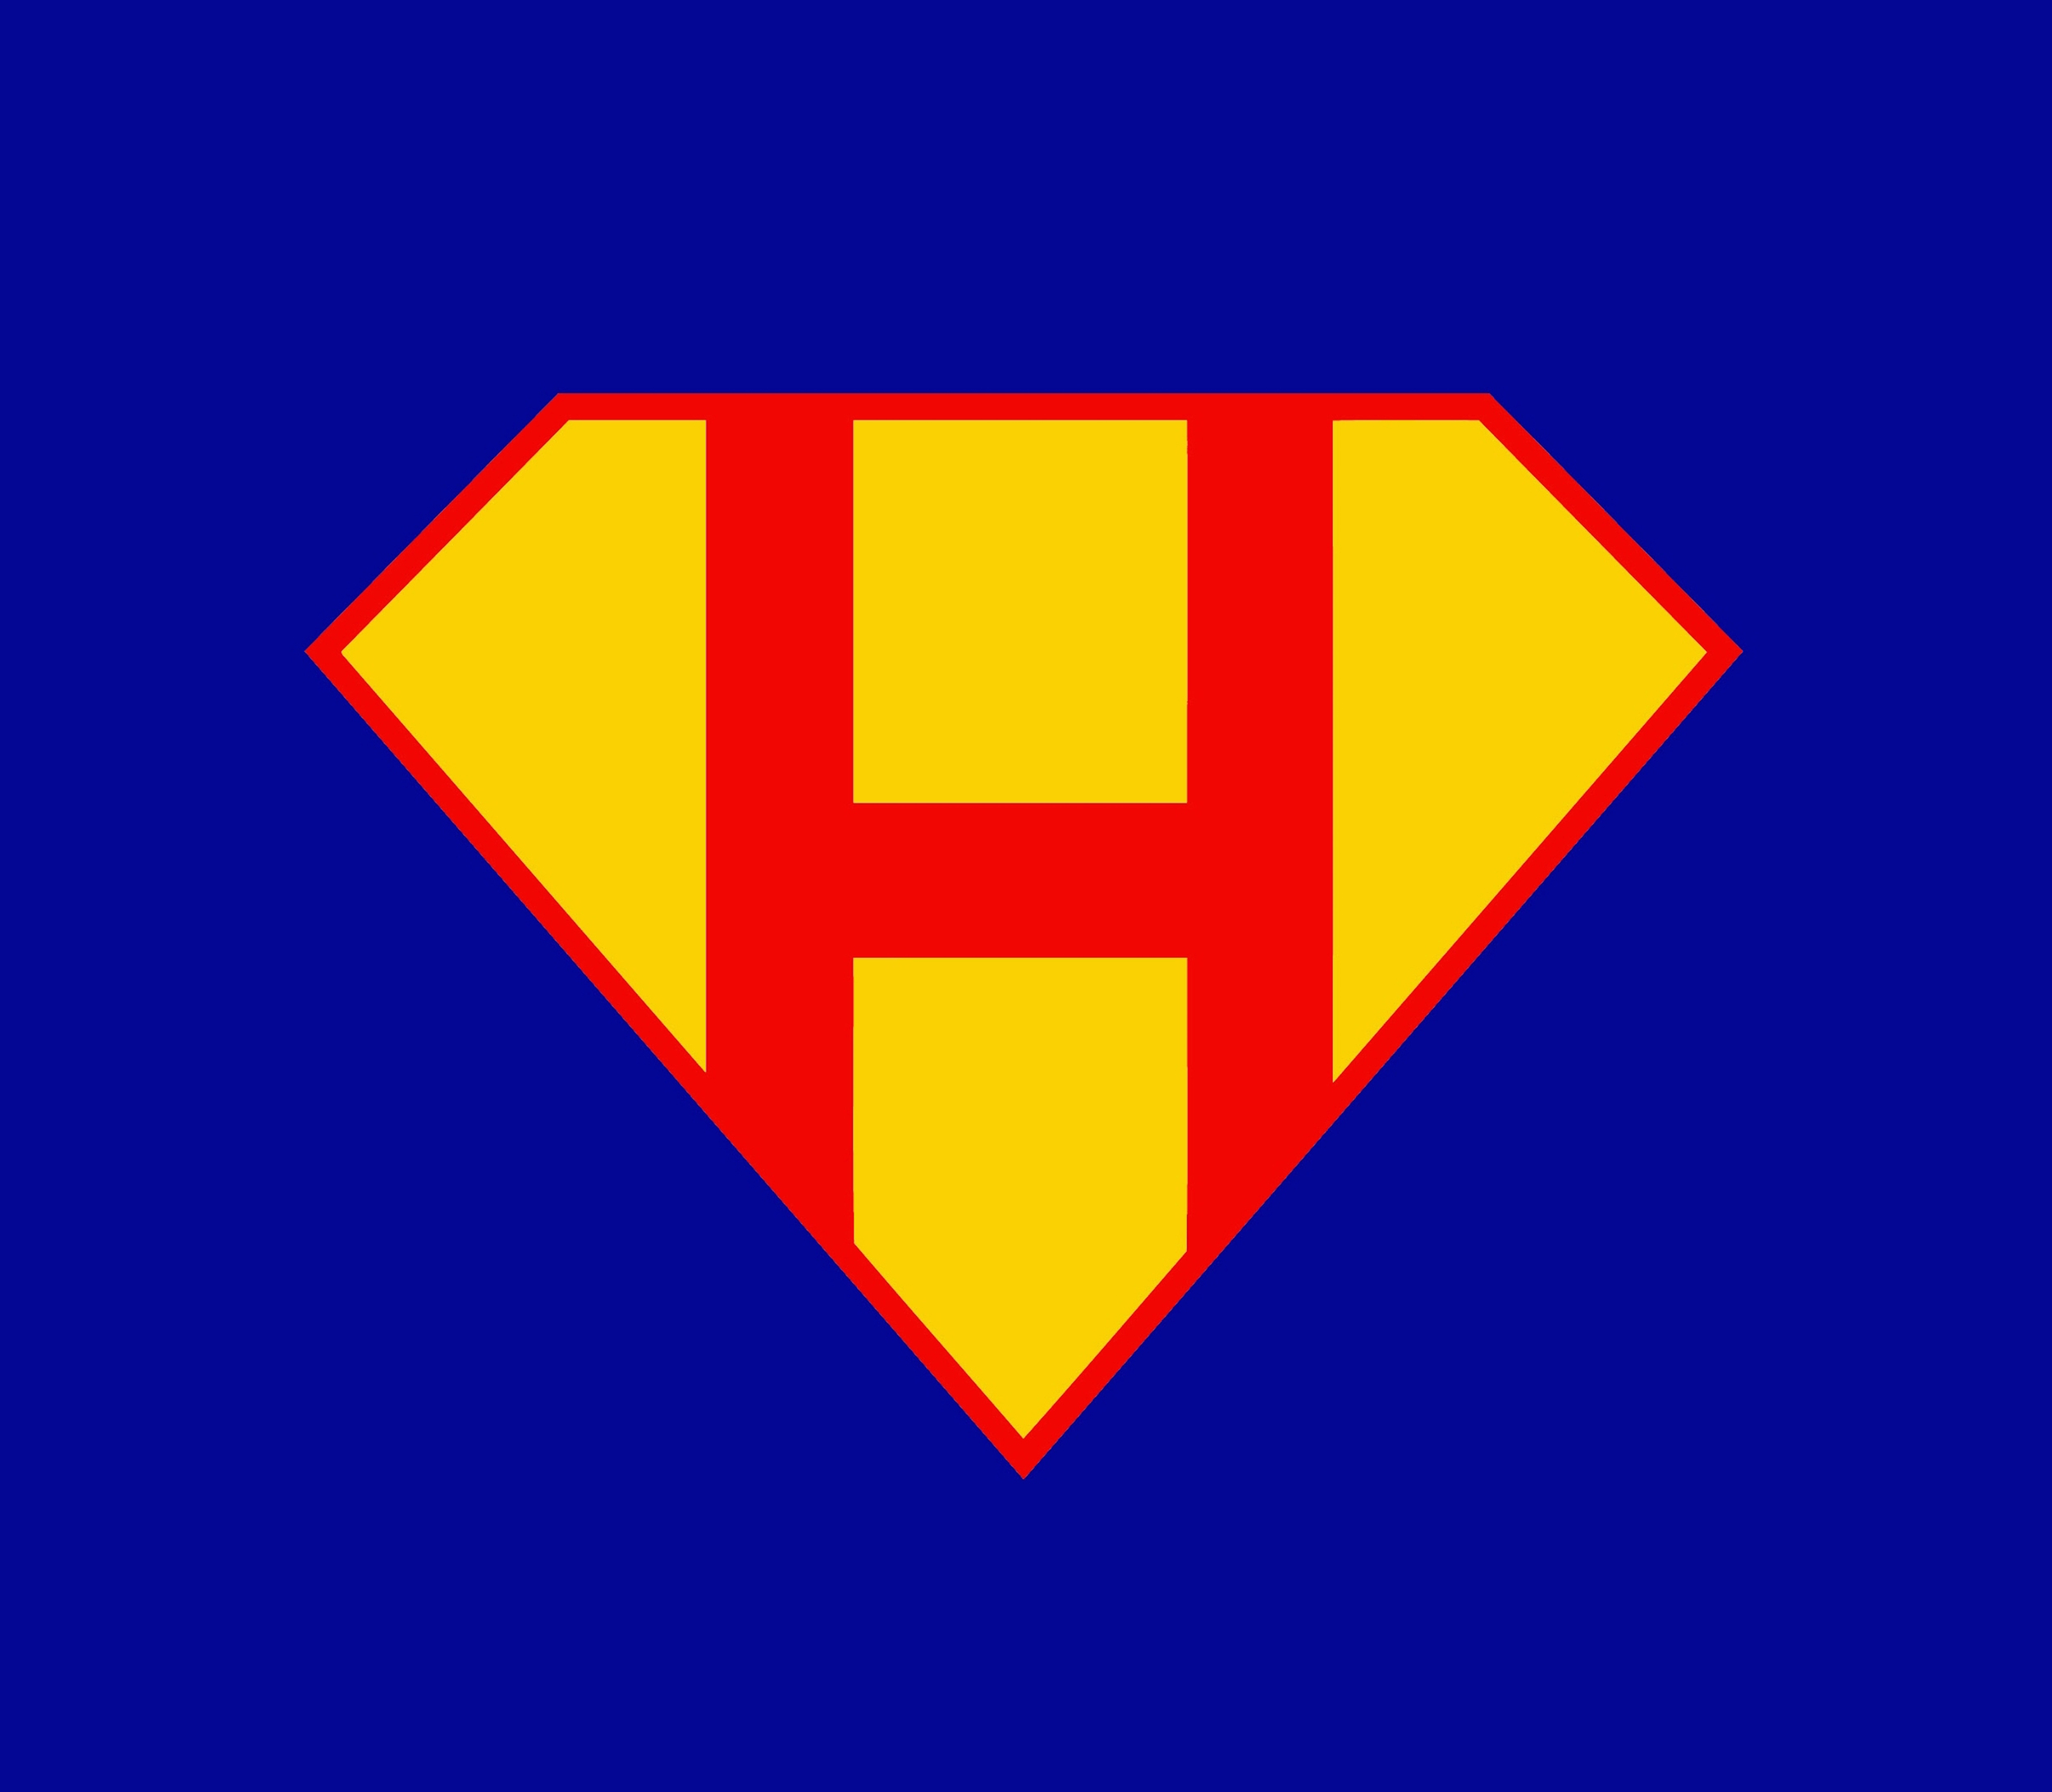 Housemaidhero logo best [362364].jpg